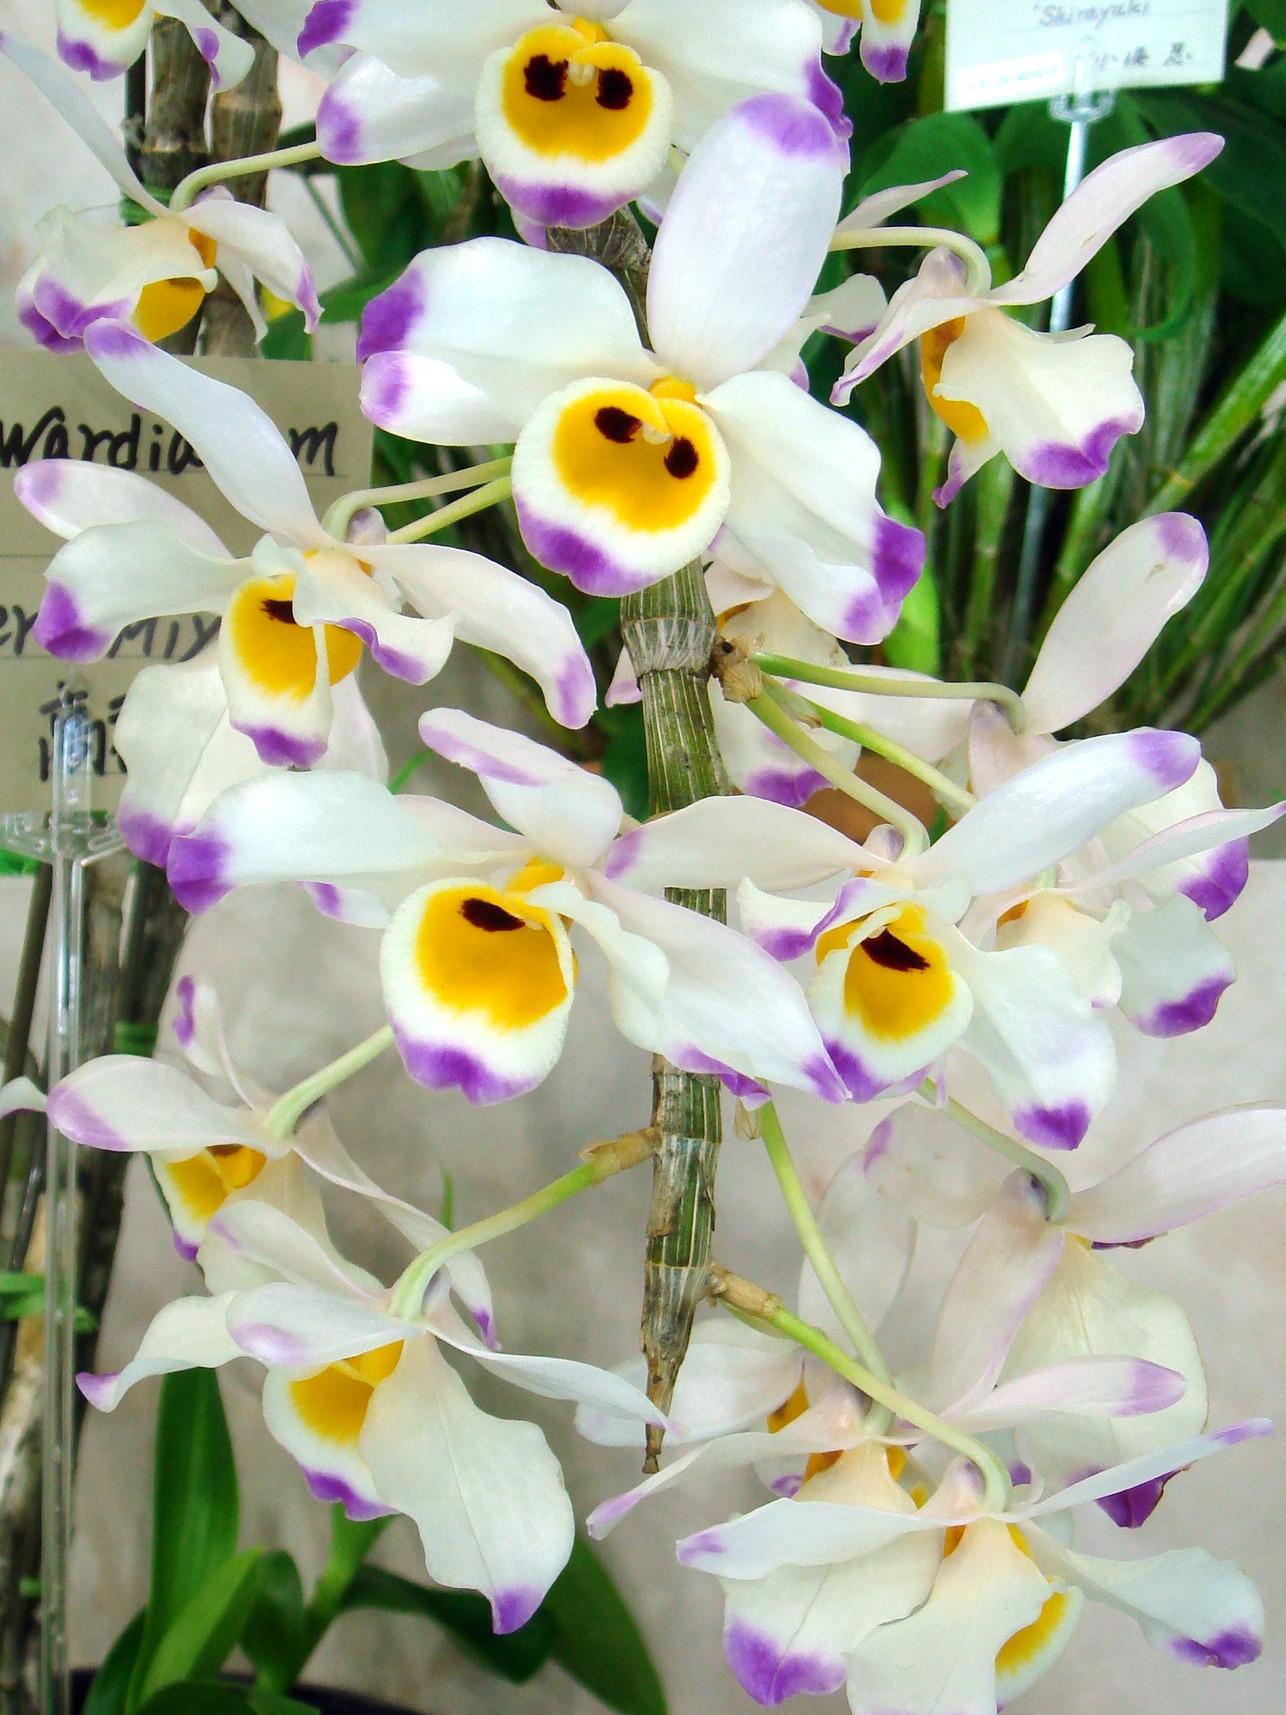 http://orchids.la.coocan.jp/Dendrobium/Dendrobium%20wardianum/DSC01698.JPG